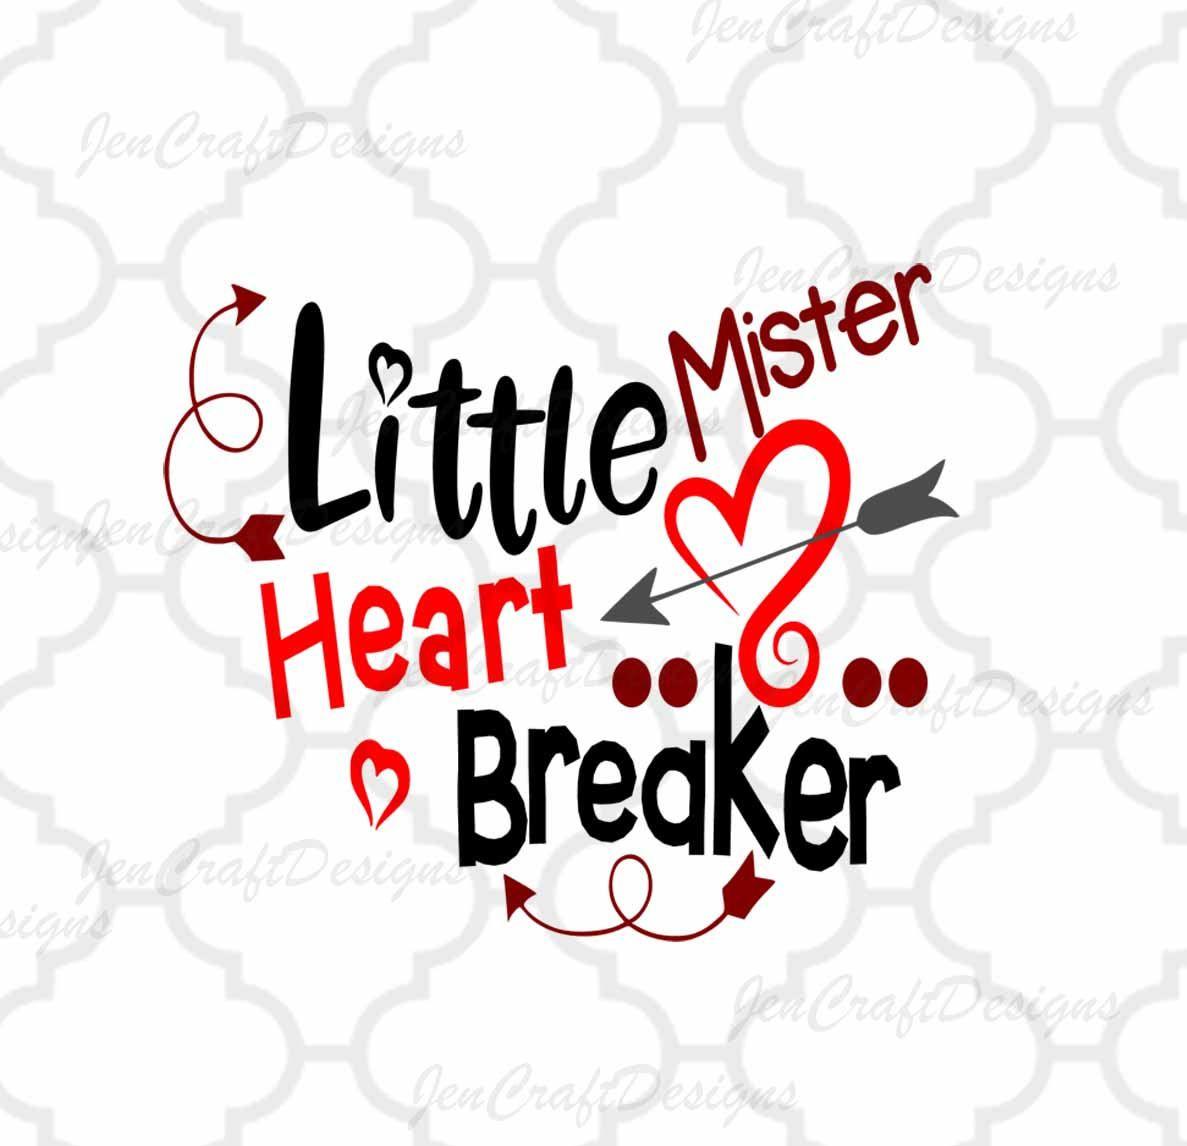 Little Mister Heart Breaker Svg Valentine Svg Toddler Etsy Valentines Svg Cricut Valentine Ideas Silouette Cameo Projects